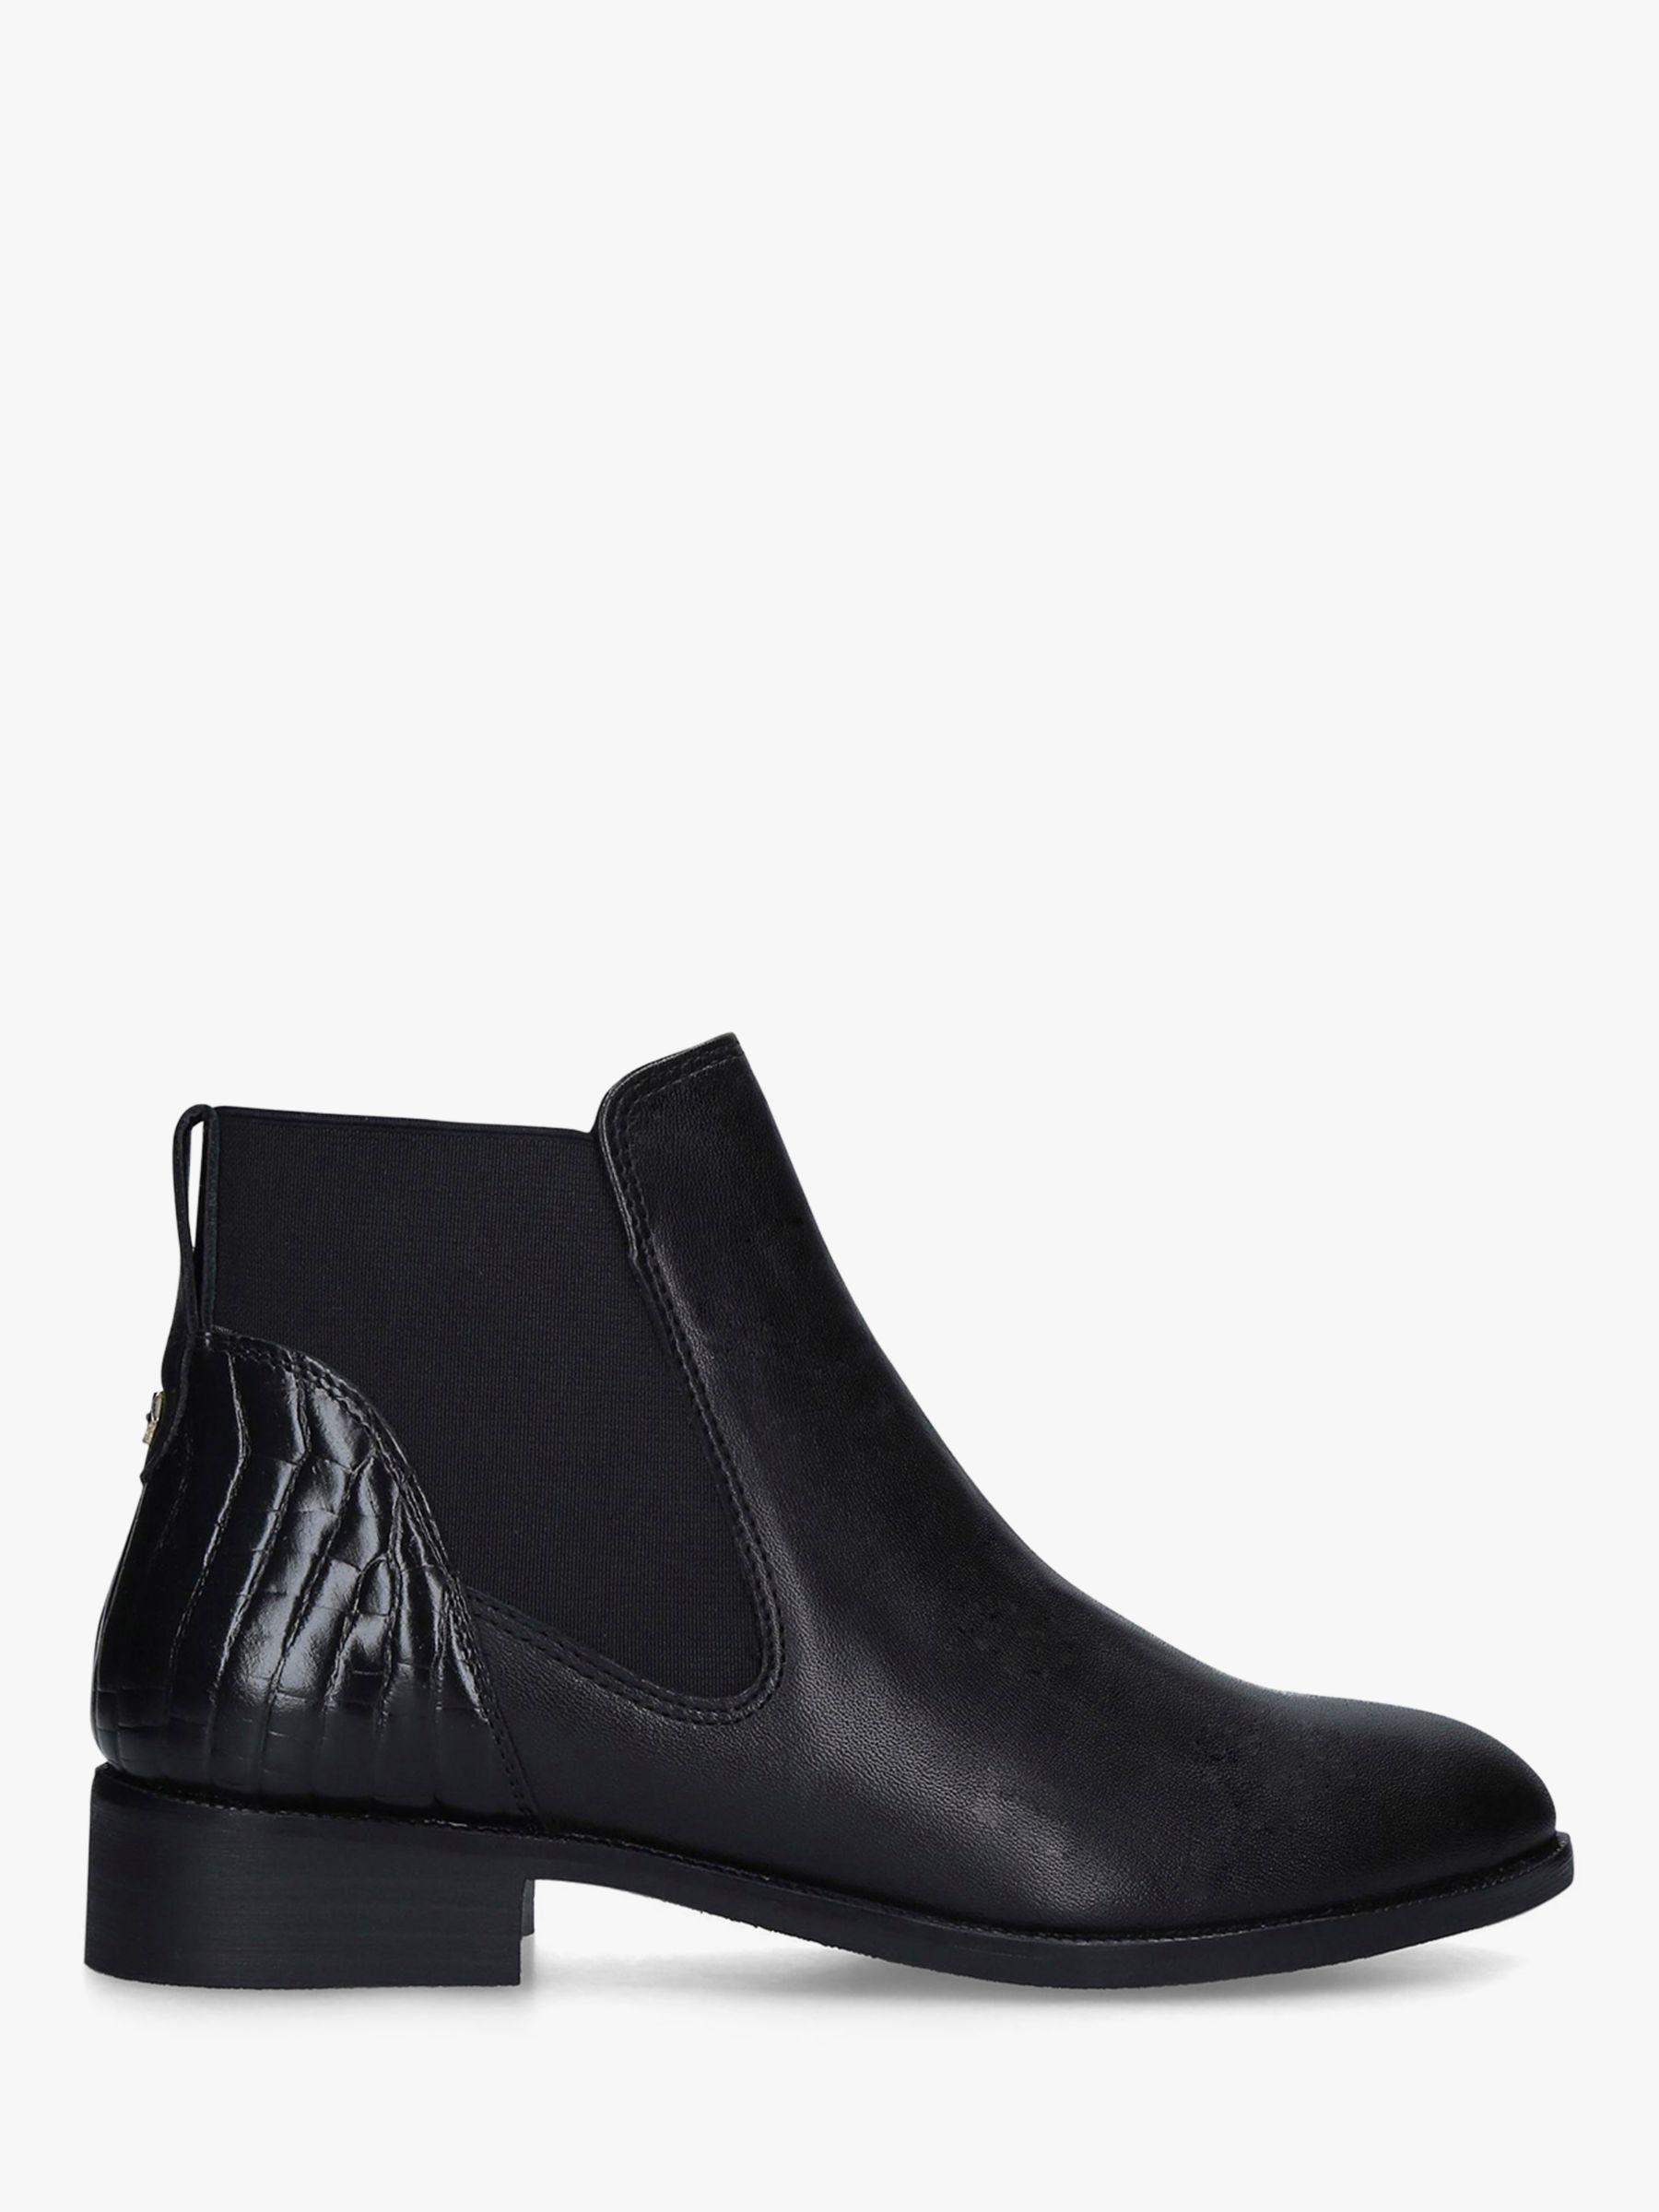 Carvela Carvela Stifle Leather Chelsea Boots, Black